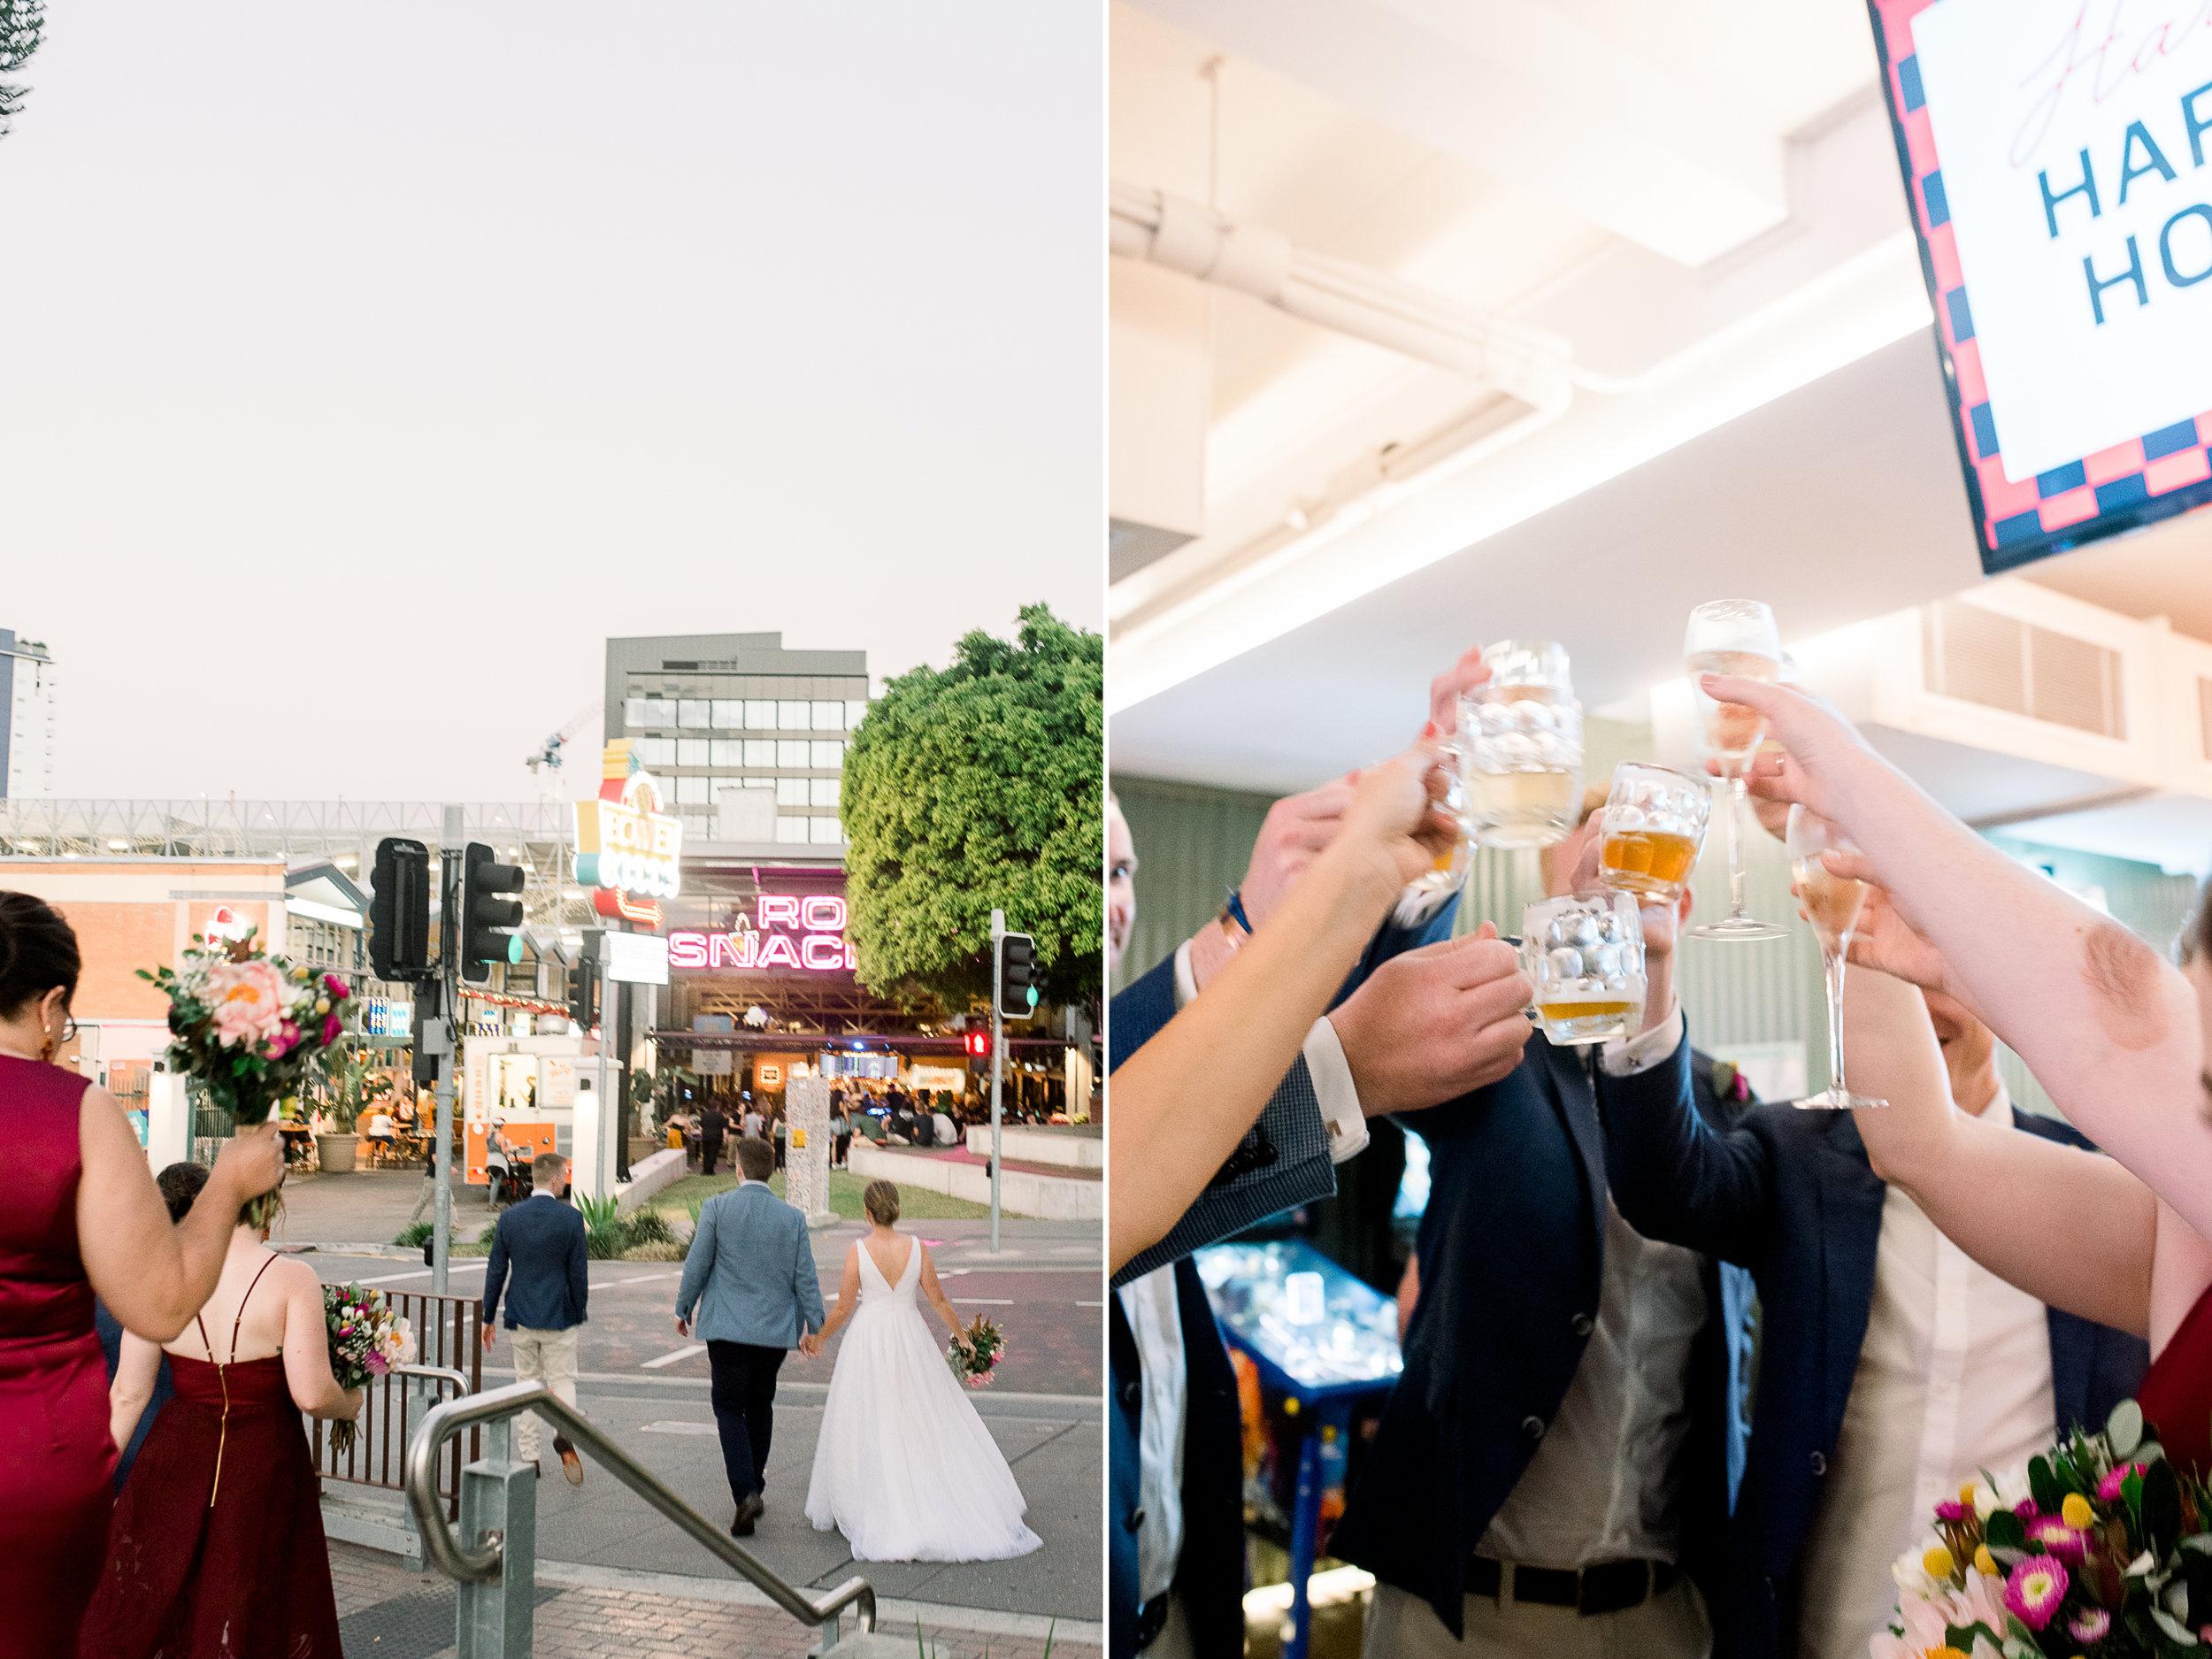 brisbane-city-refinery-wedding-photography-film-29.jpg